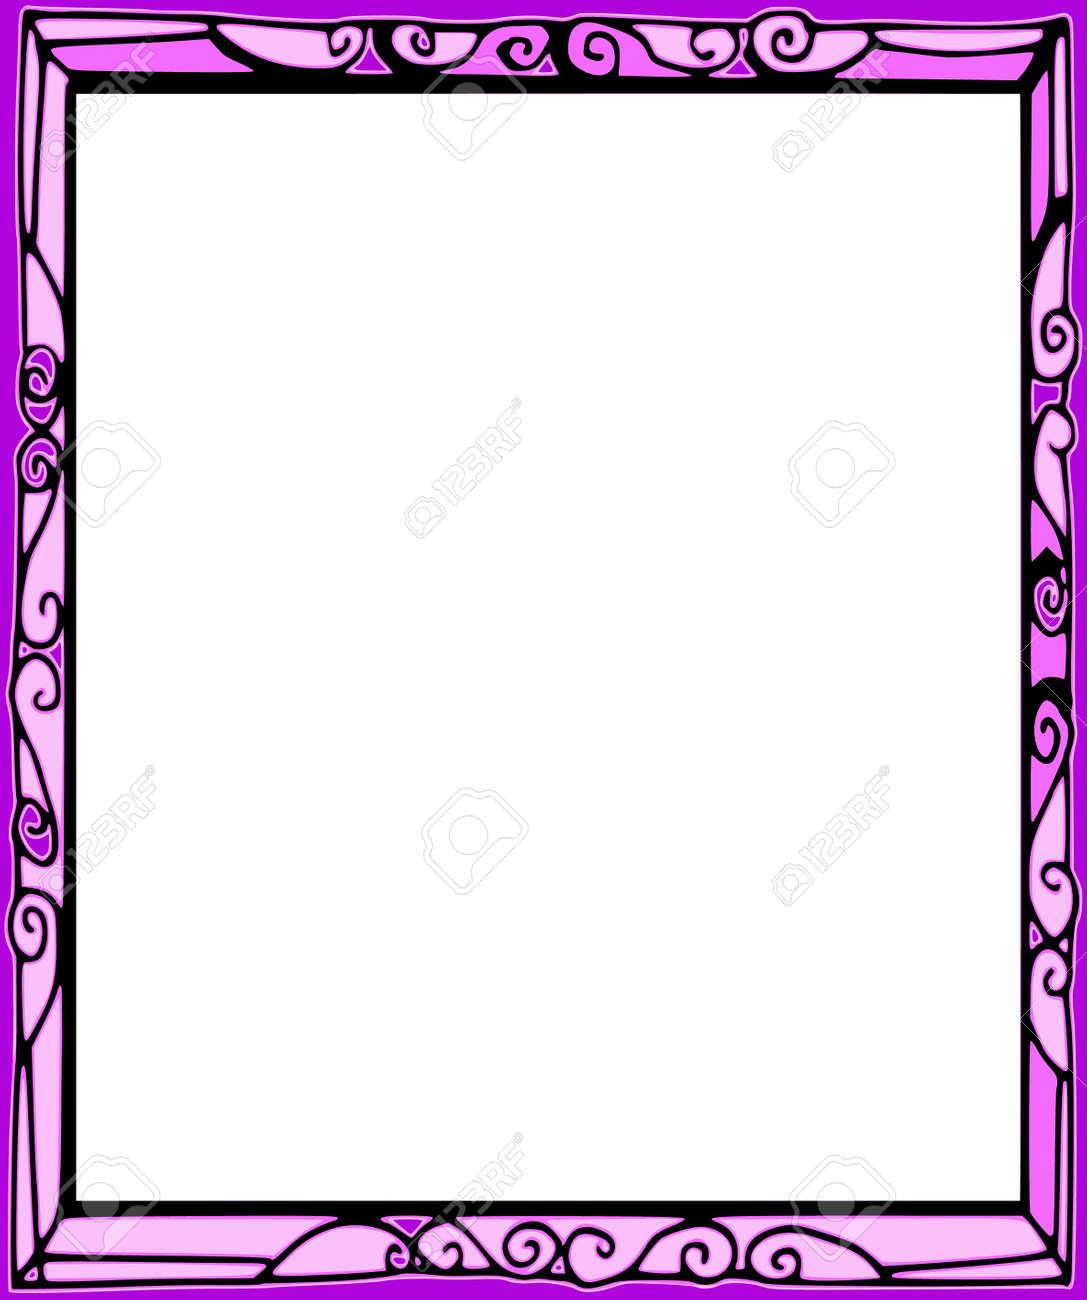 Background Series Hand Draw Frame Cartoon Style Stock Photo